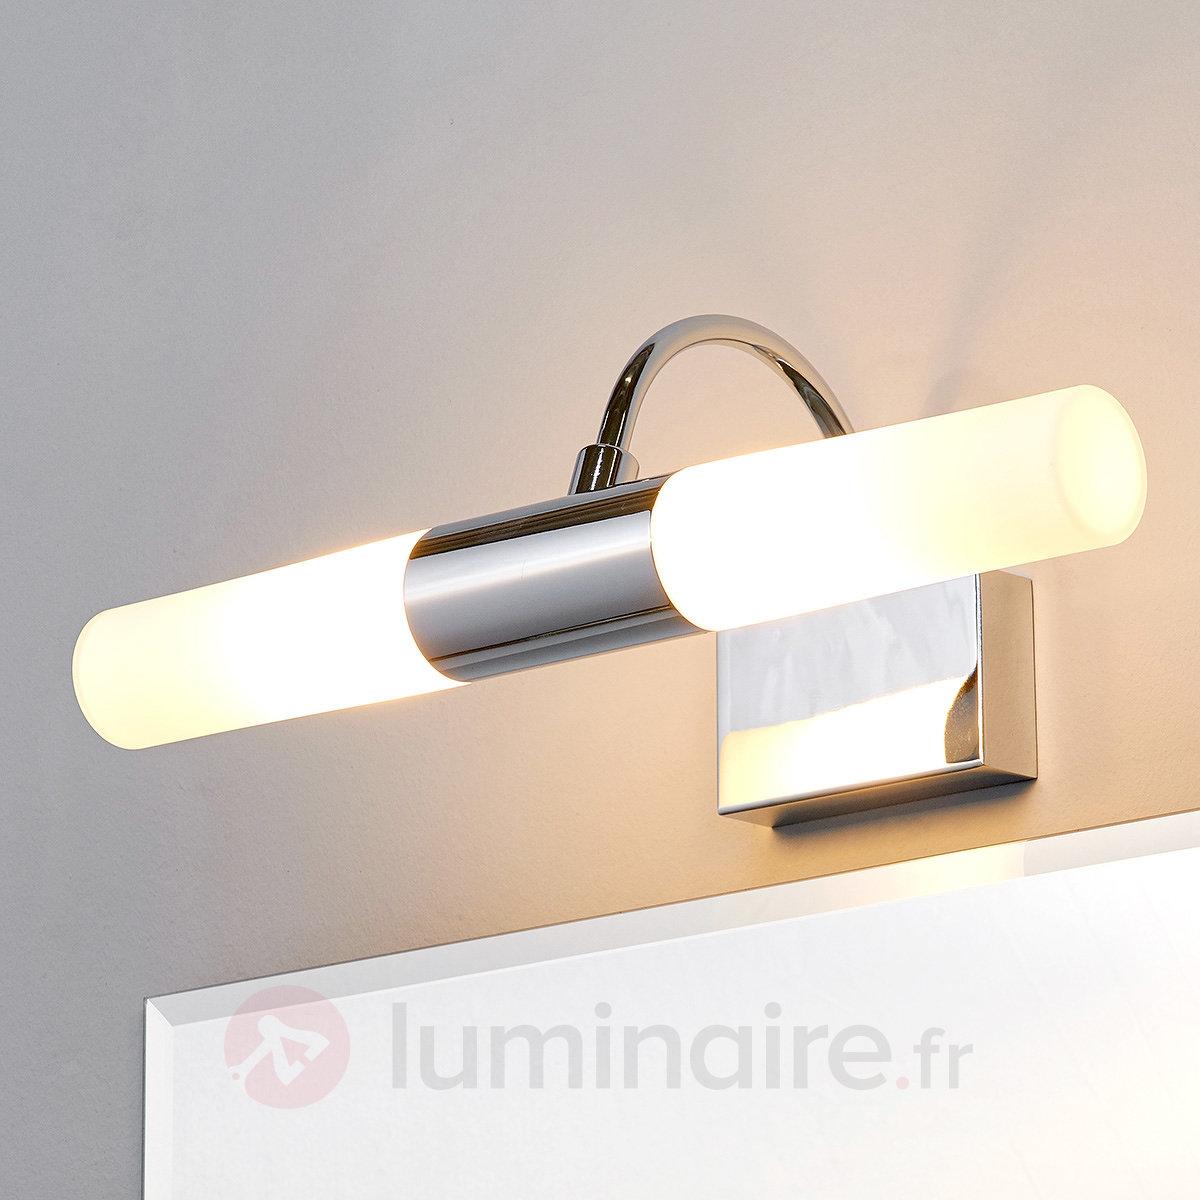 applique salle de bain avec interrupteur ikea meilleur de stock eclairage neon salle de bain. Black Bedroom Furniture Sets. Home Design Ideas